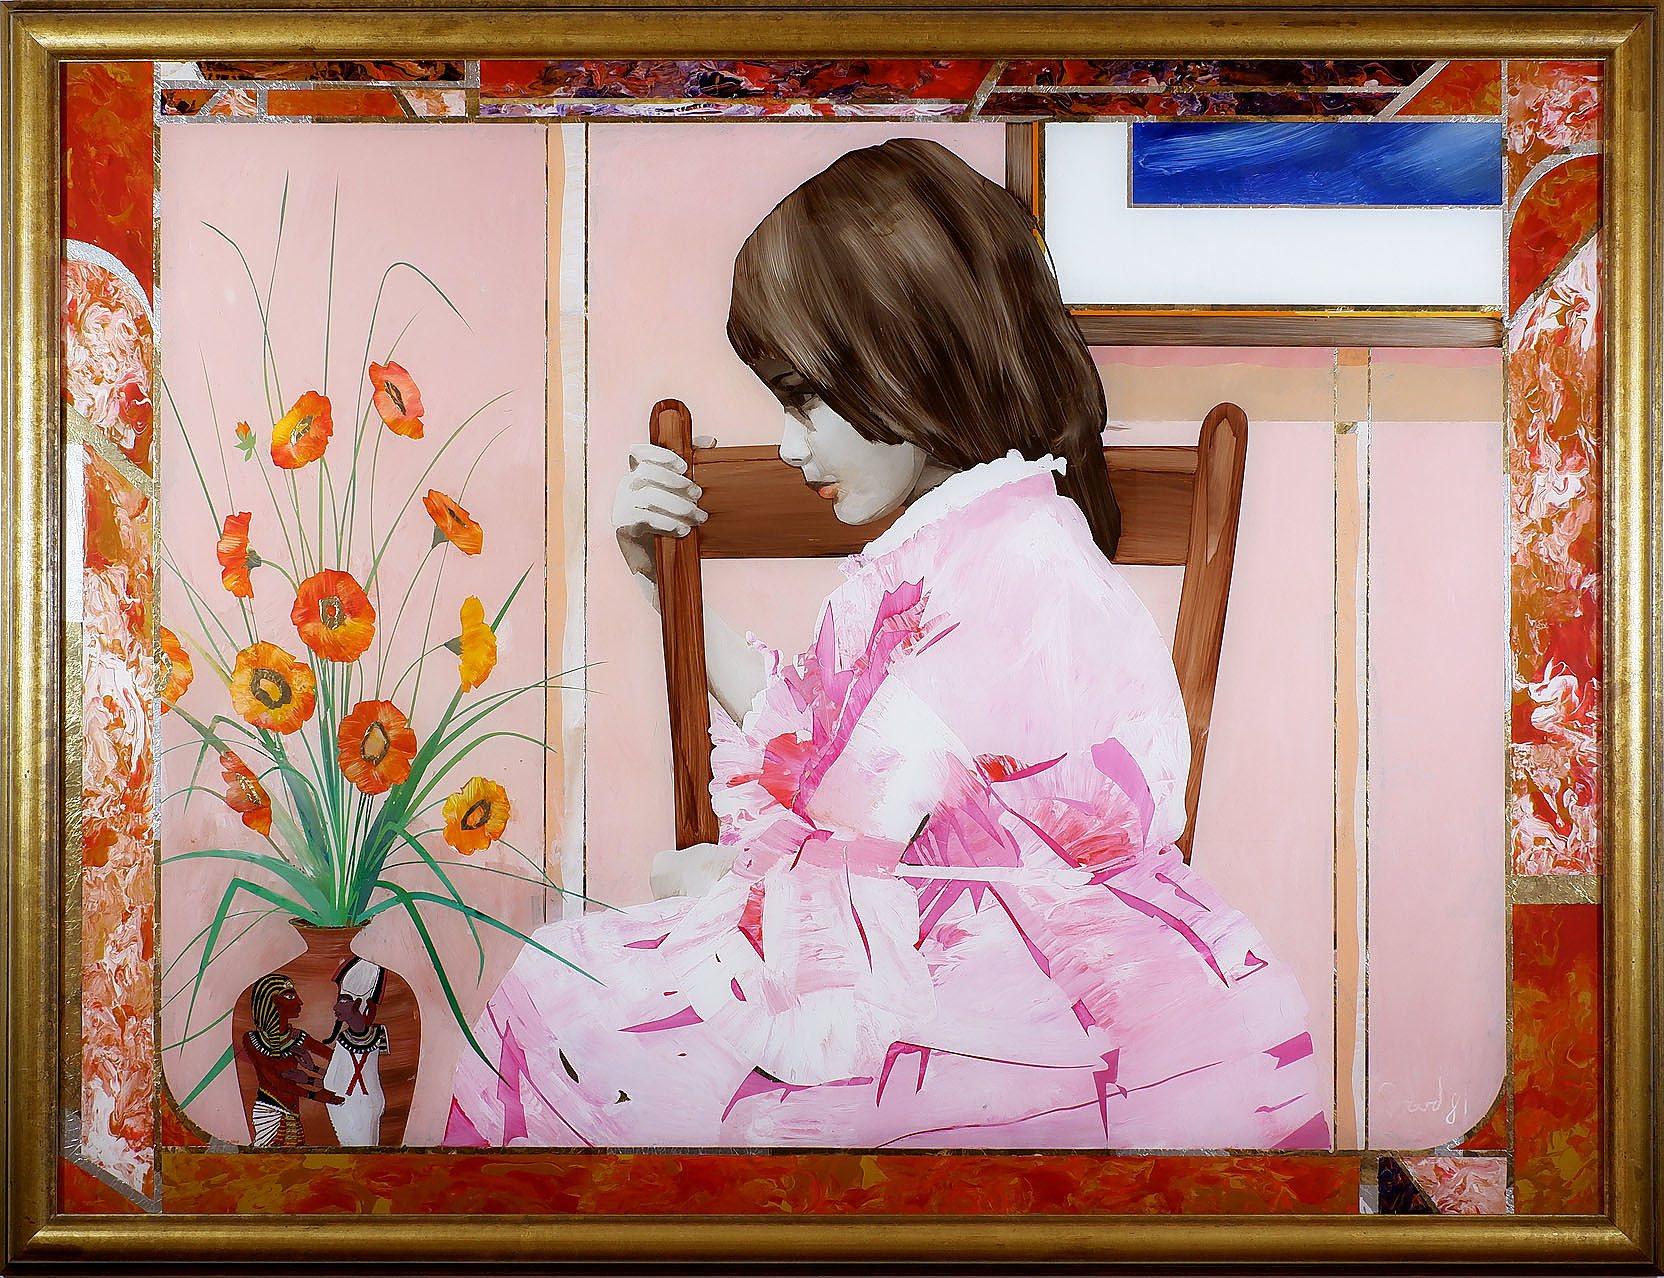 'Geoffrey Proud (b. 1946), Girl in Pink Dress, Mixed Media on Glass'